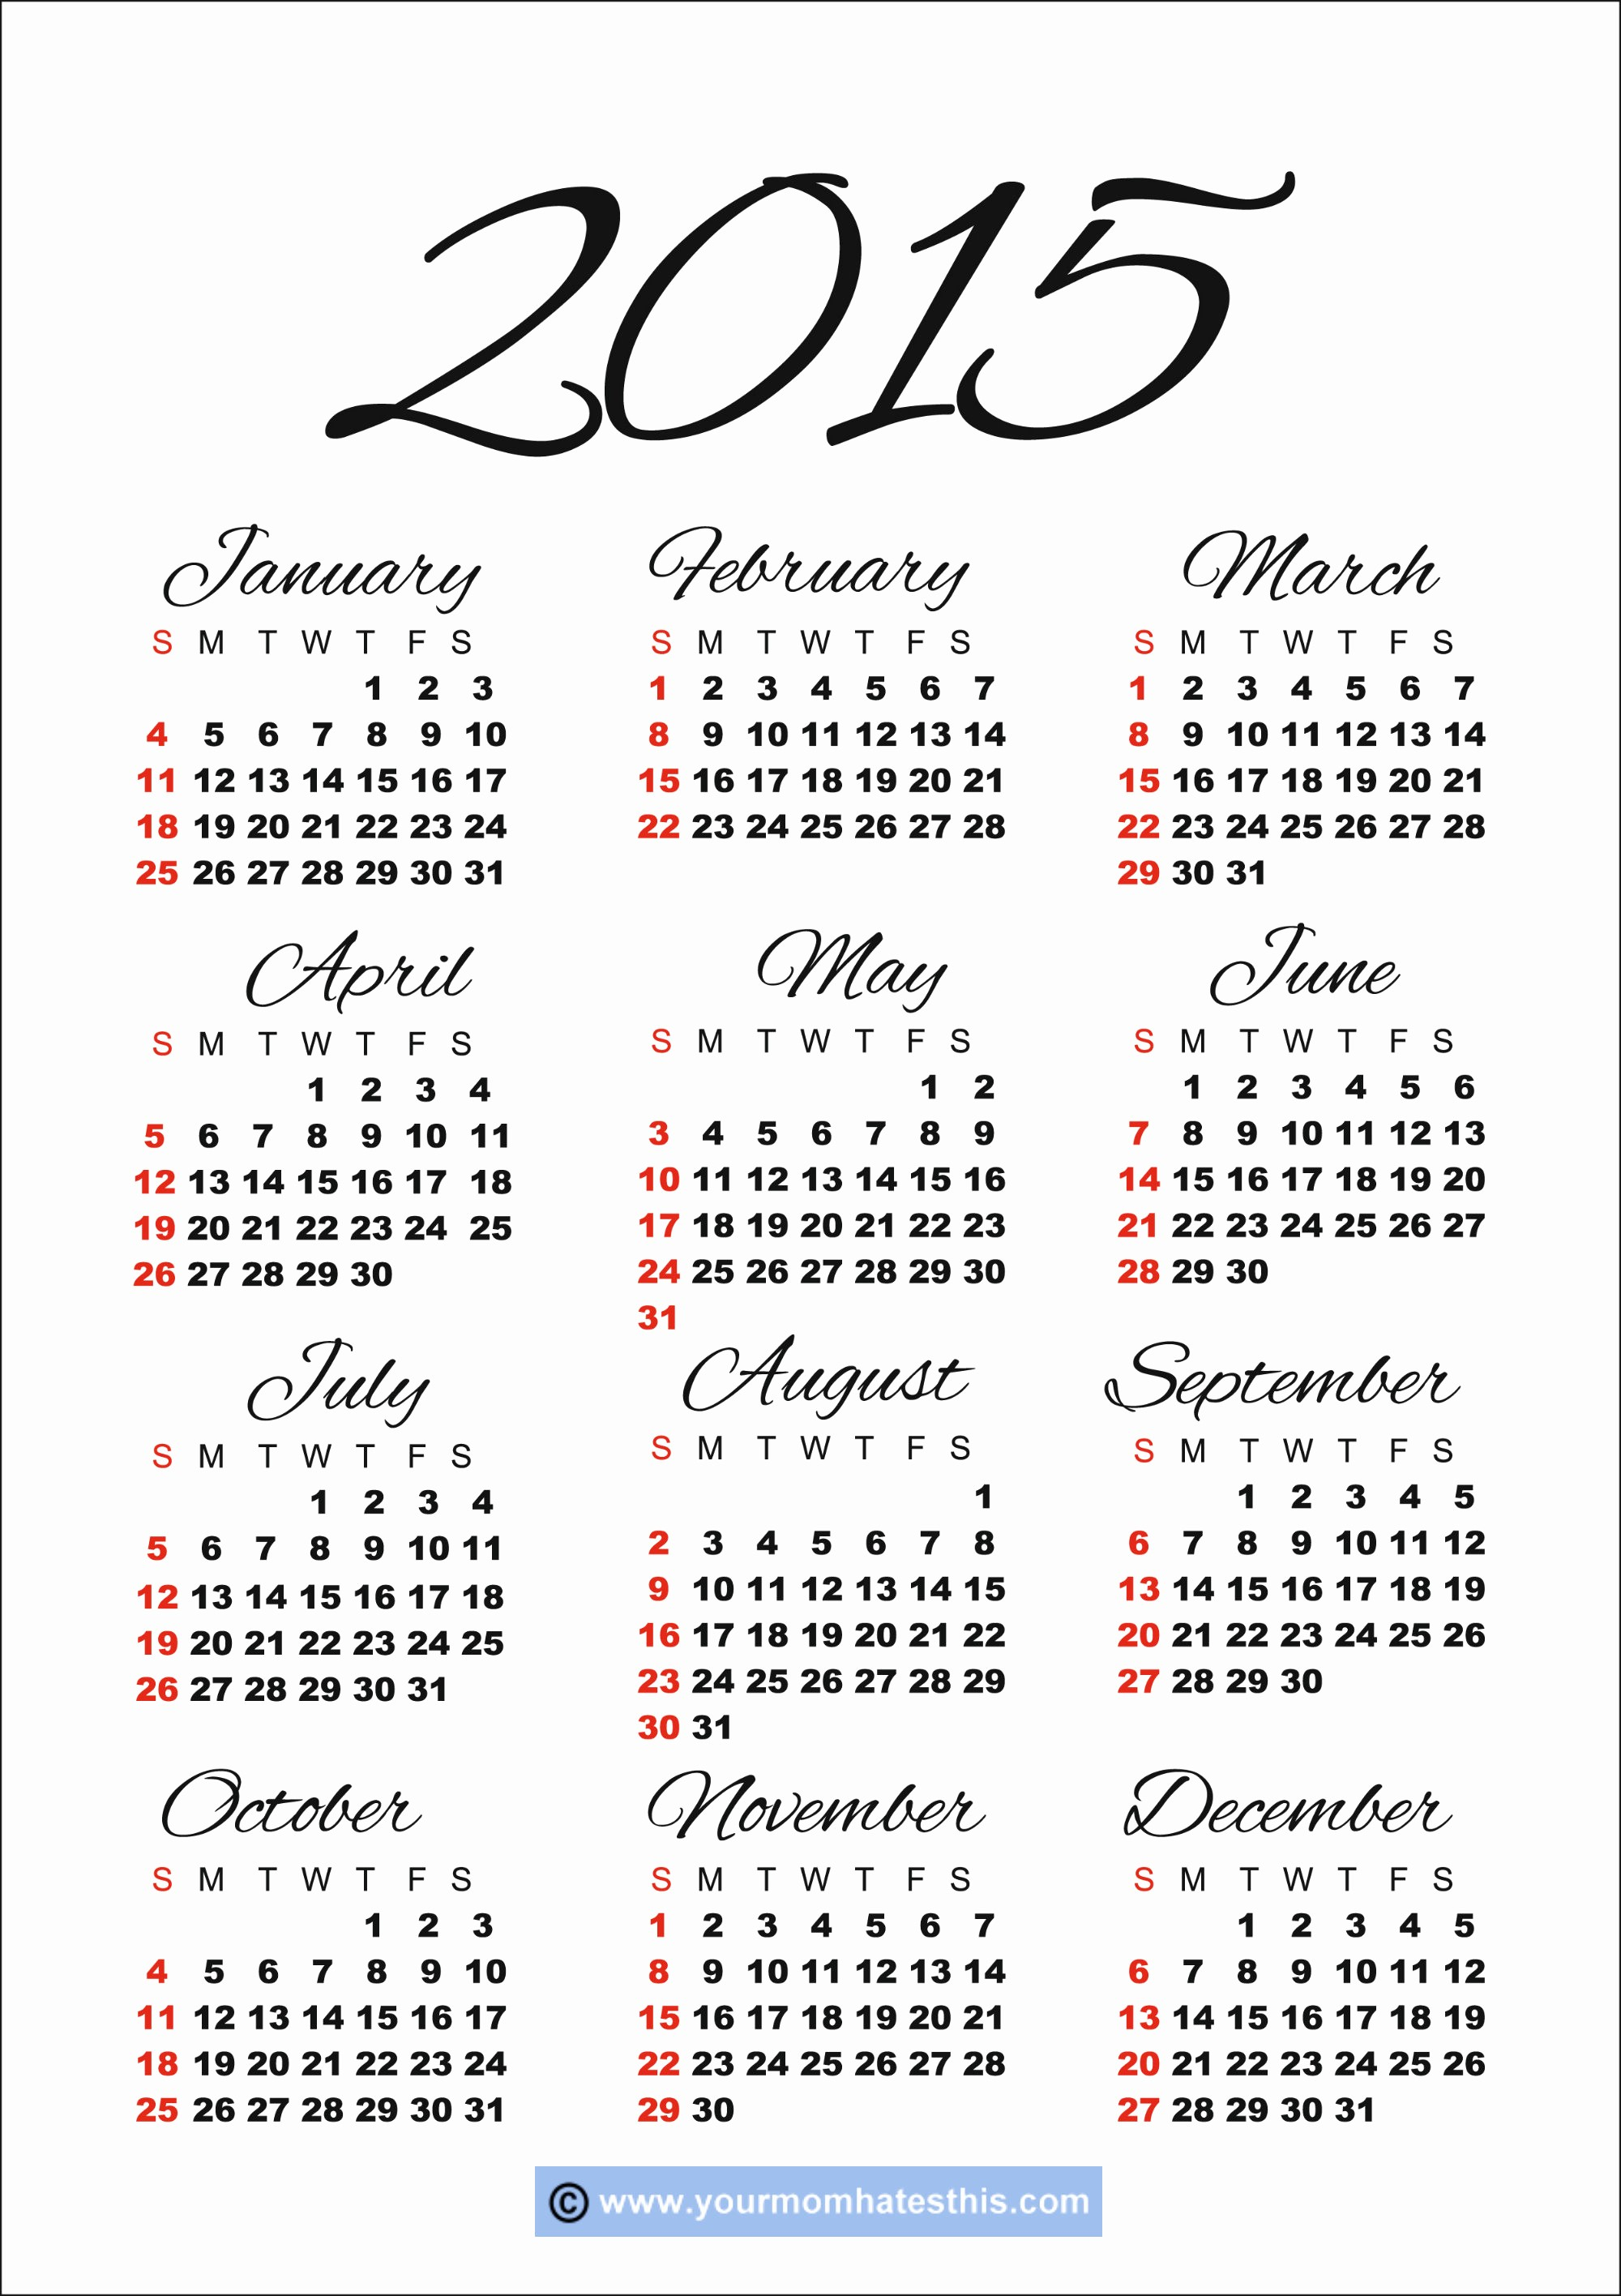 Calendar 2015 Printable with Holidays Inspirational Download Printable 2015 Calendar